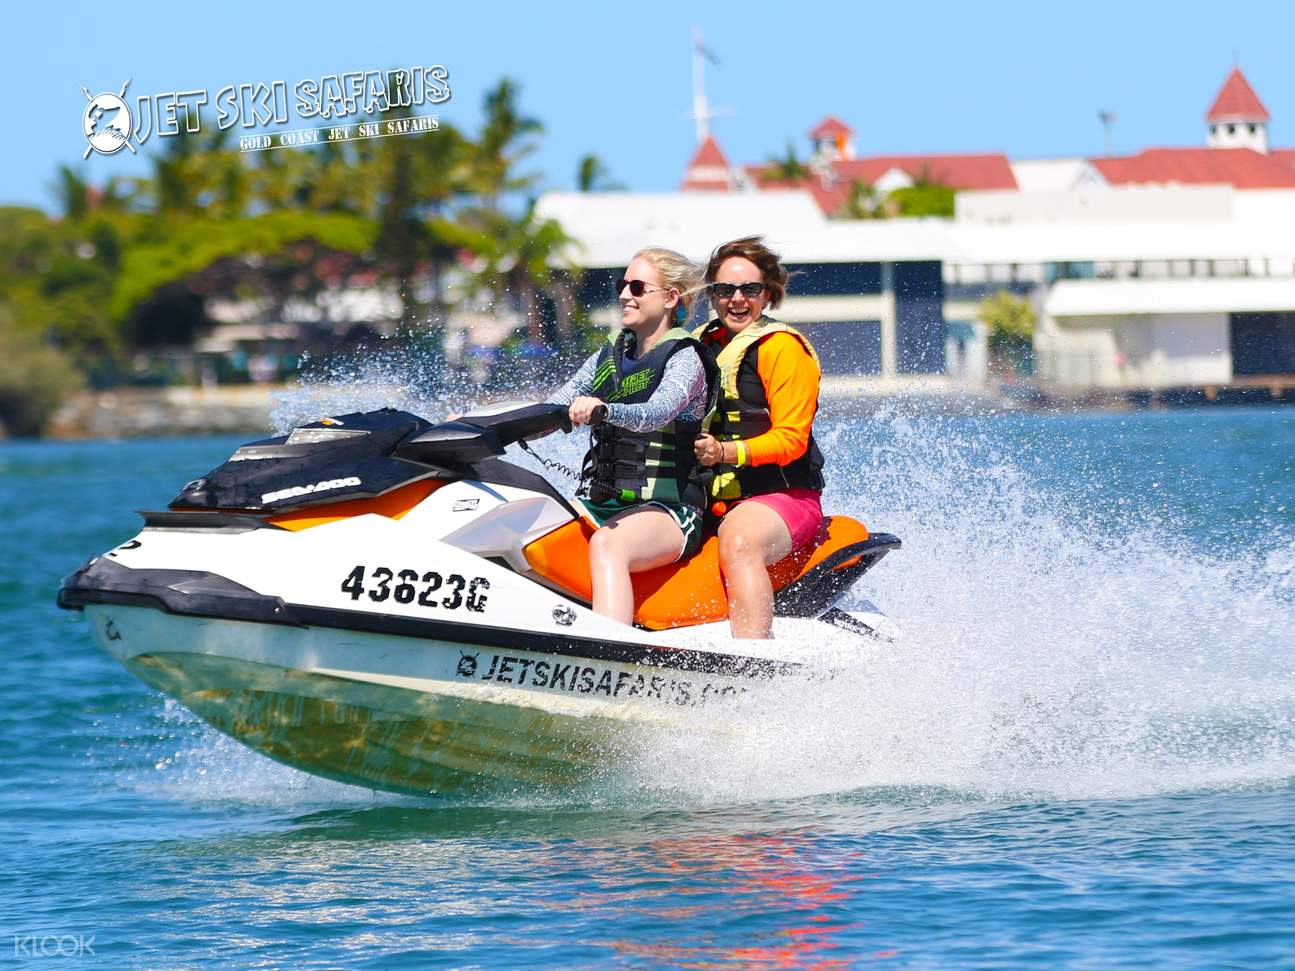 Gold Coast Jet Boat and Jet Ski Safari Experience